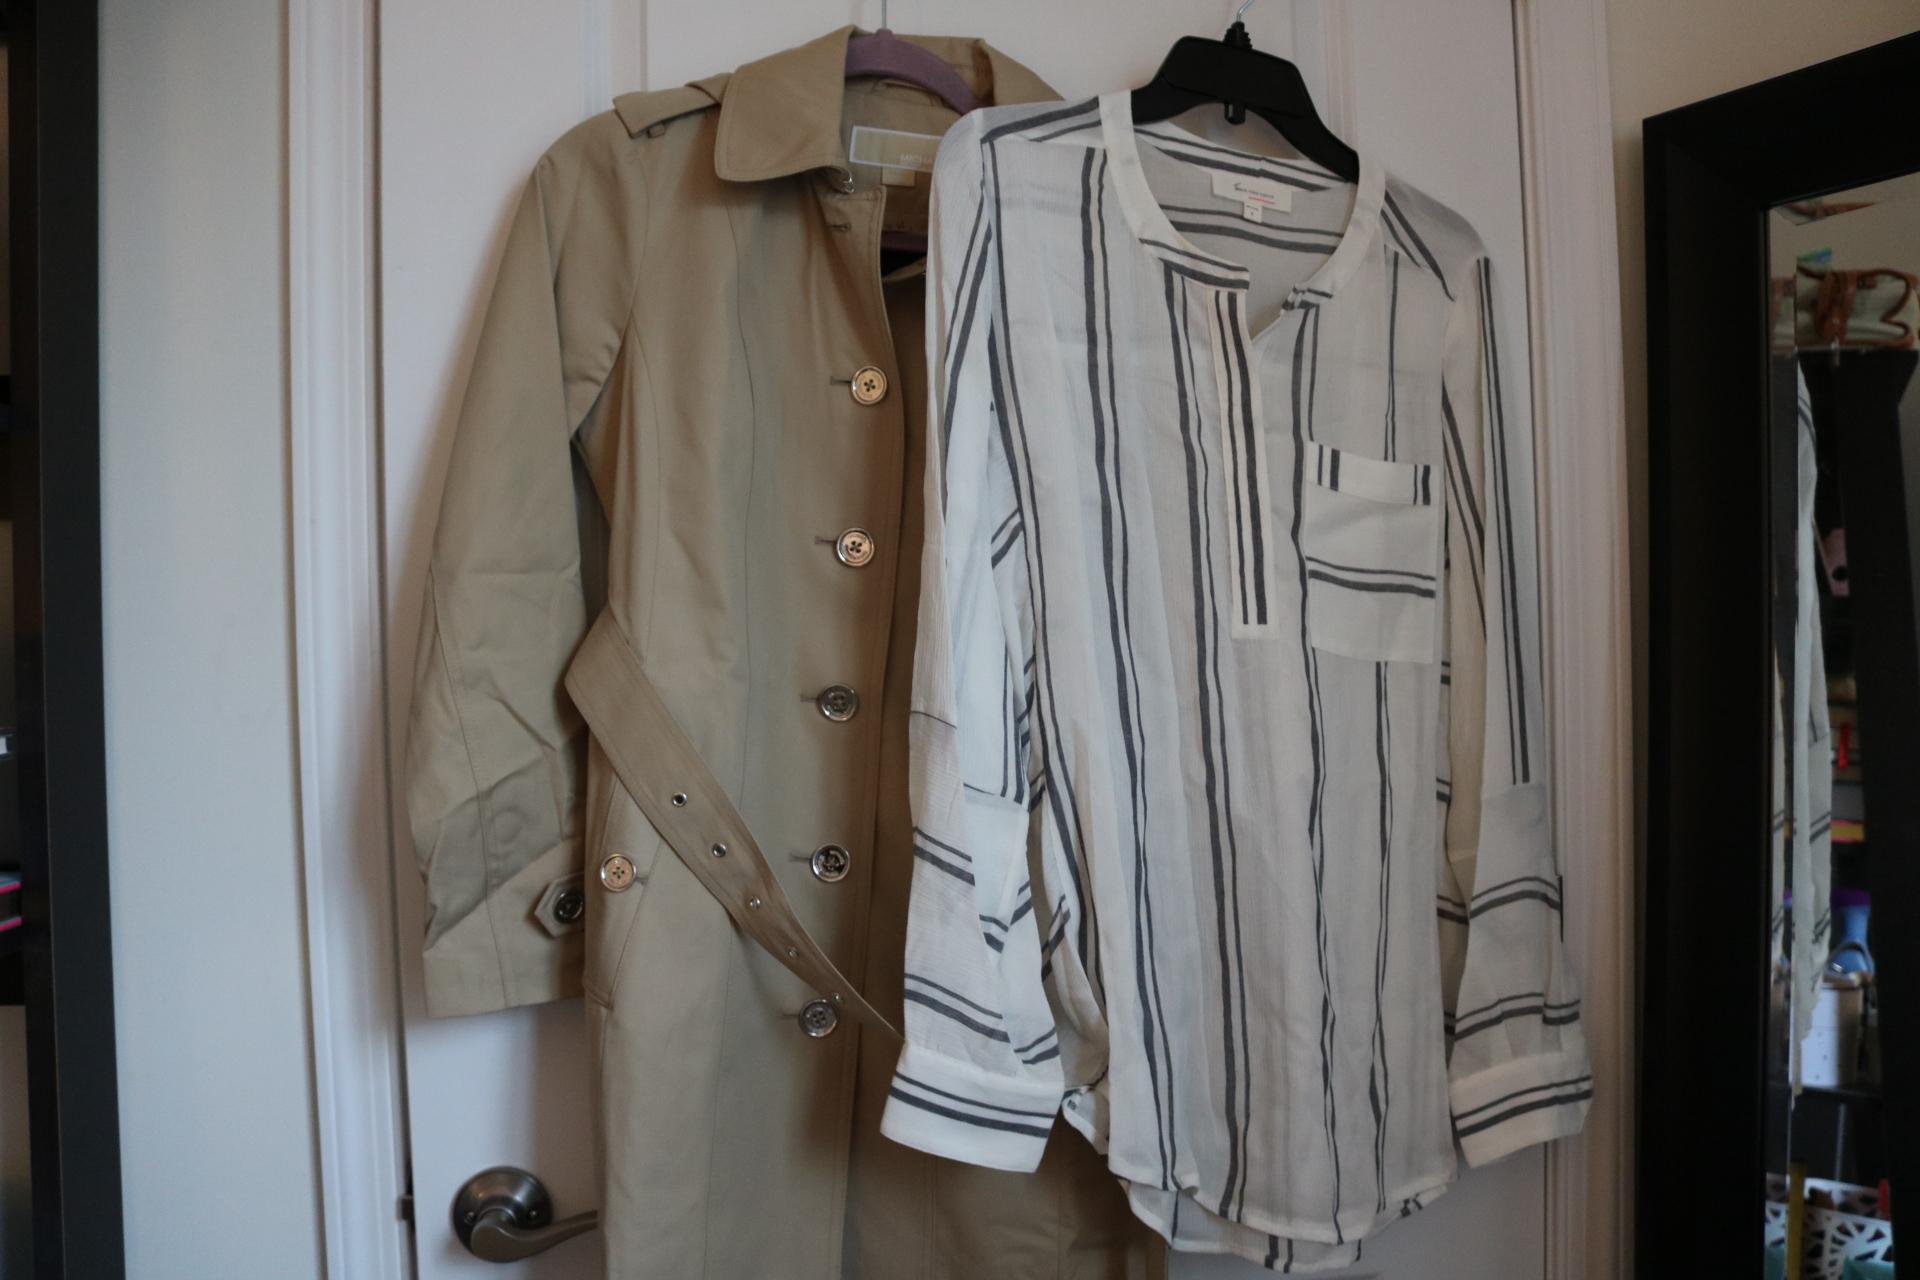 nordstrom haul, nordstom anniversary sale haul, michael kors trench coat, striped blouse